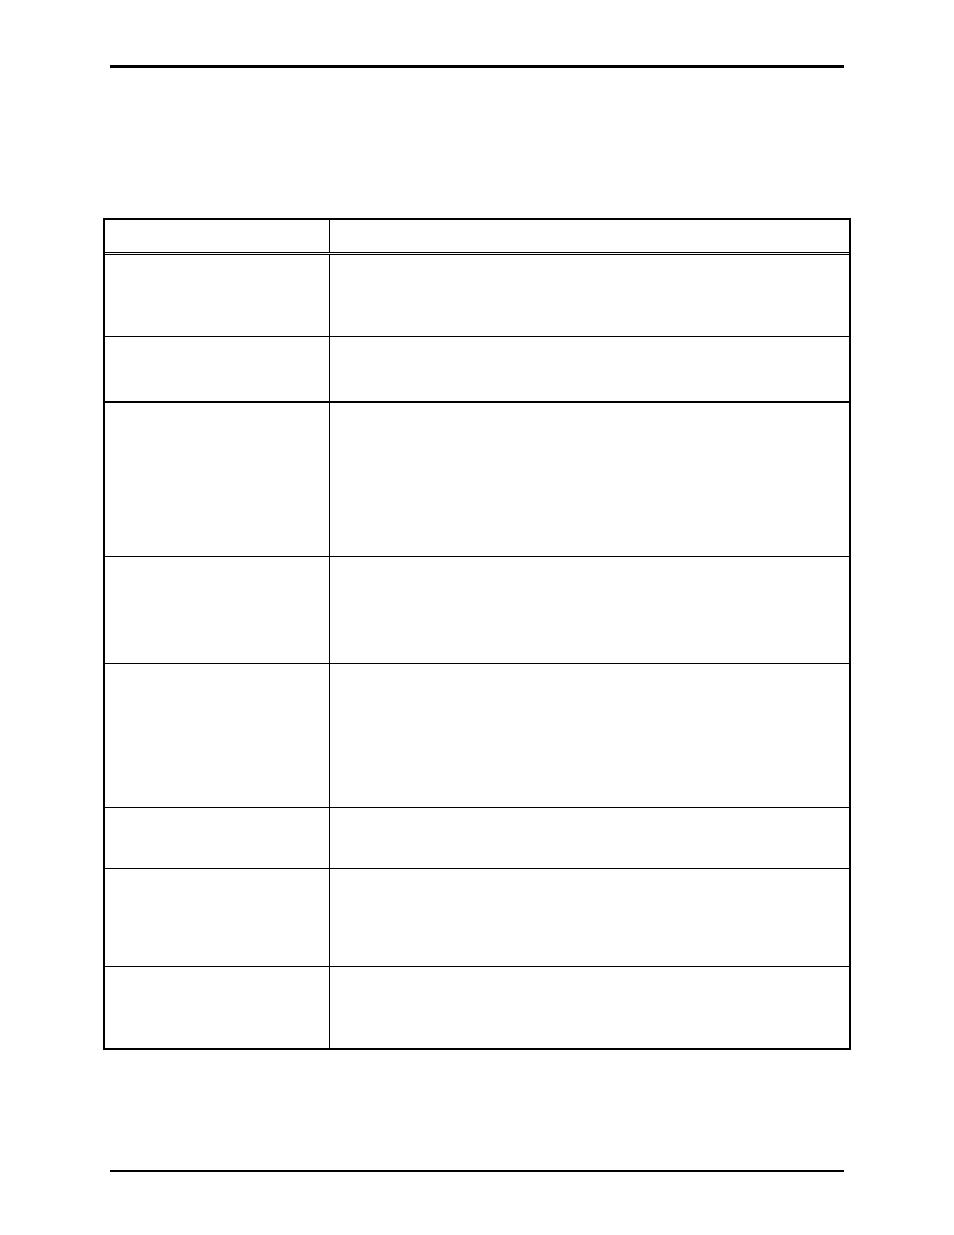 Maintenance, Troubleshooting   GAI-Tronics 701-202 Handset/Speaker